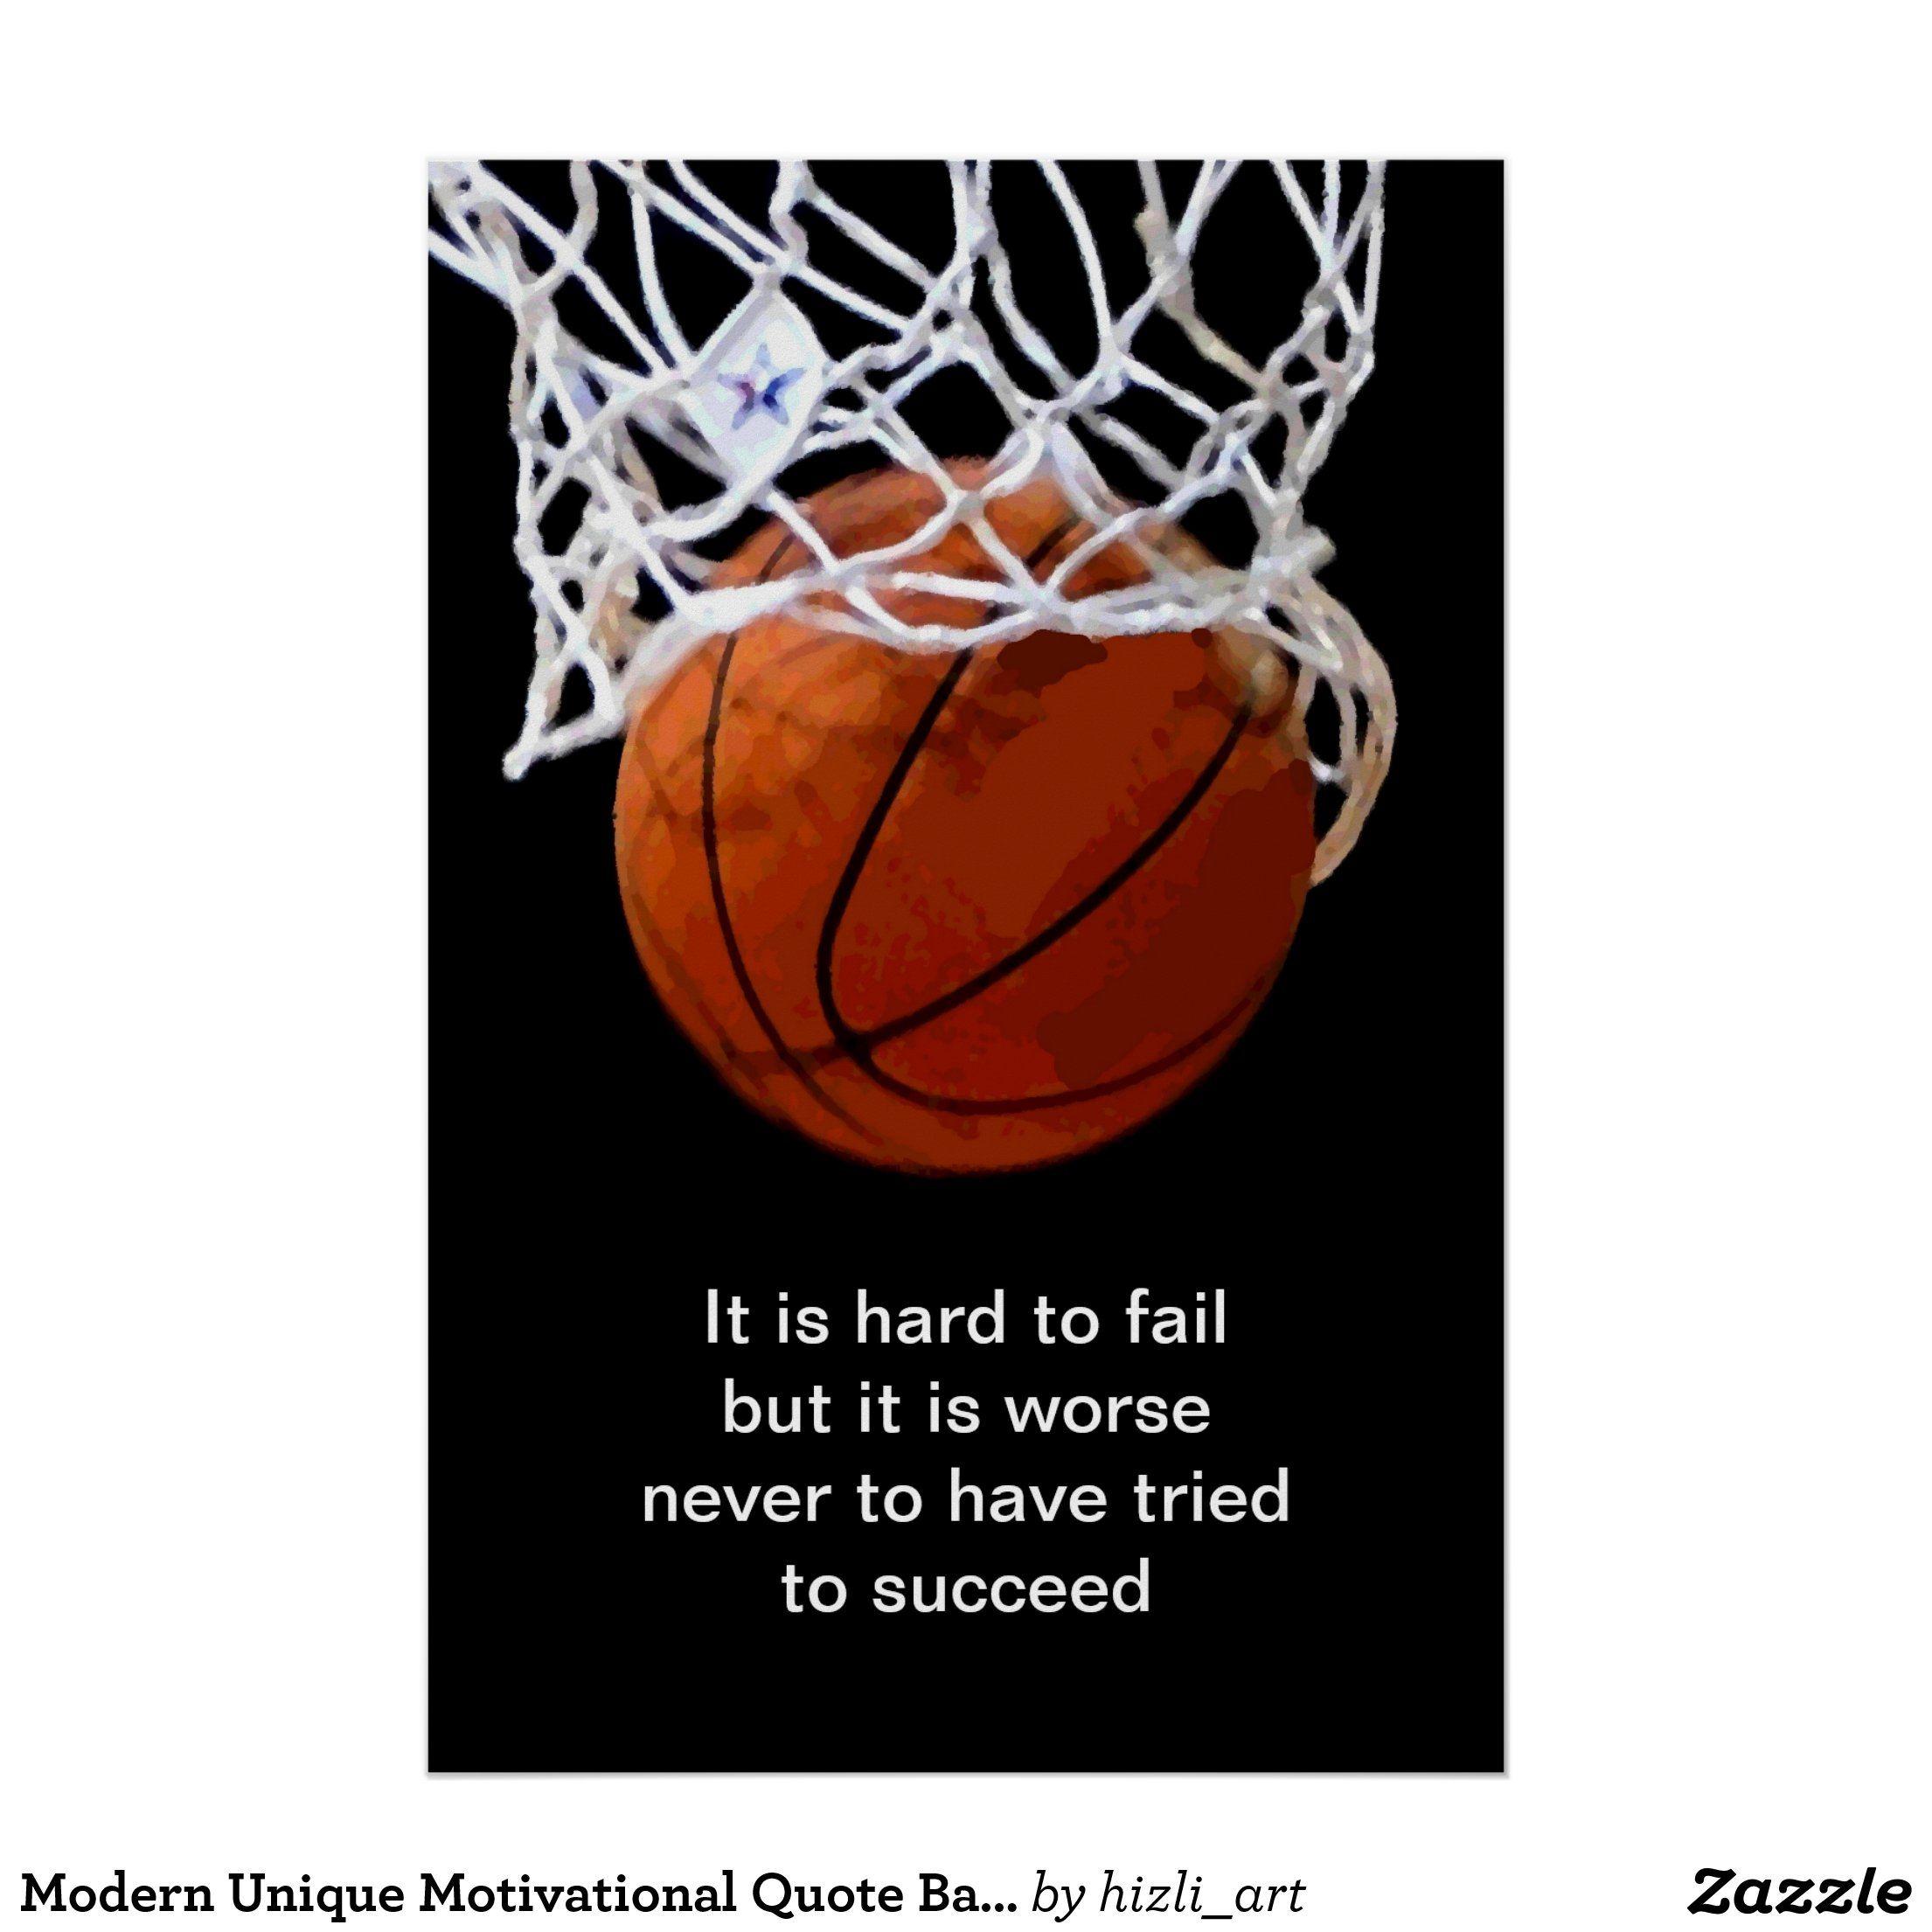 Modern Unique Motivational Quote Basketball Poster  Zazzle.com in